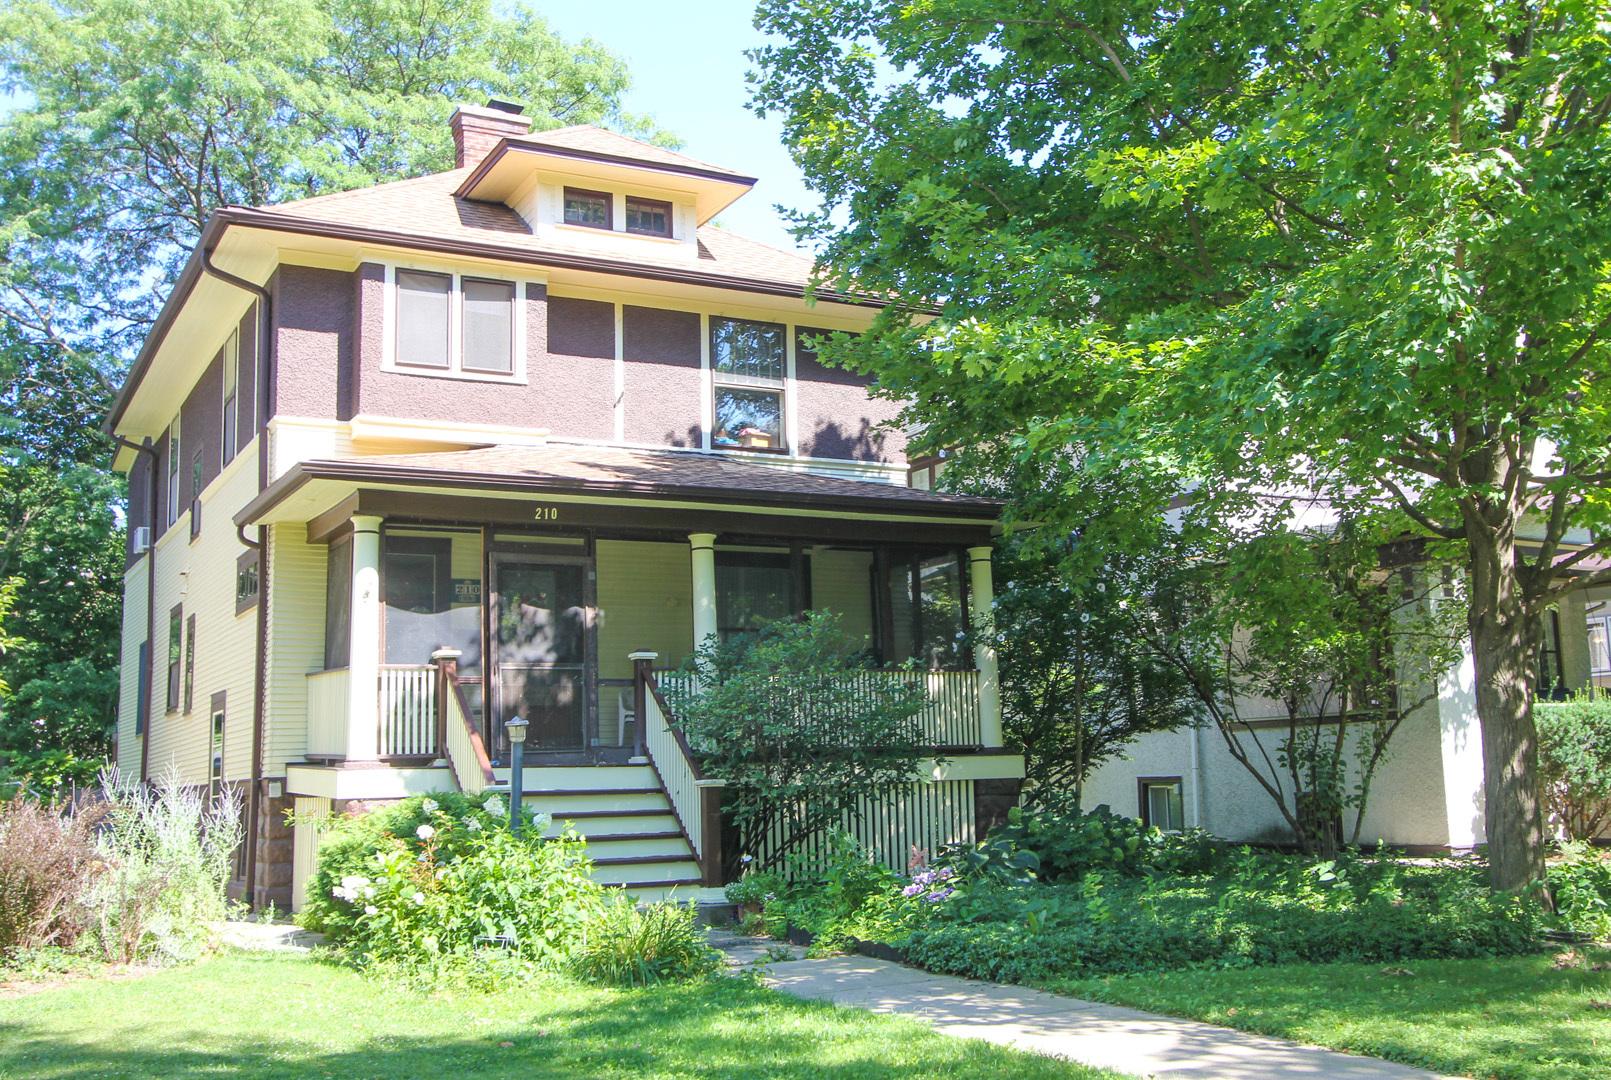 210 North Taylor Avenue, Oak Park IL 60302